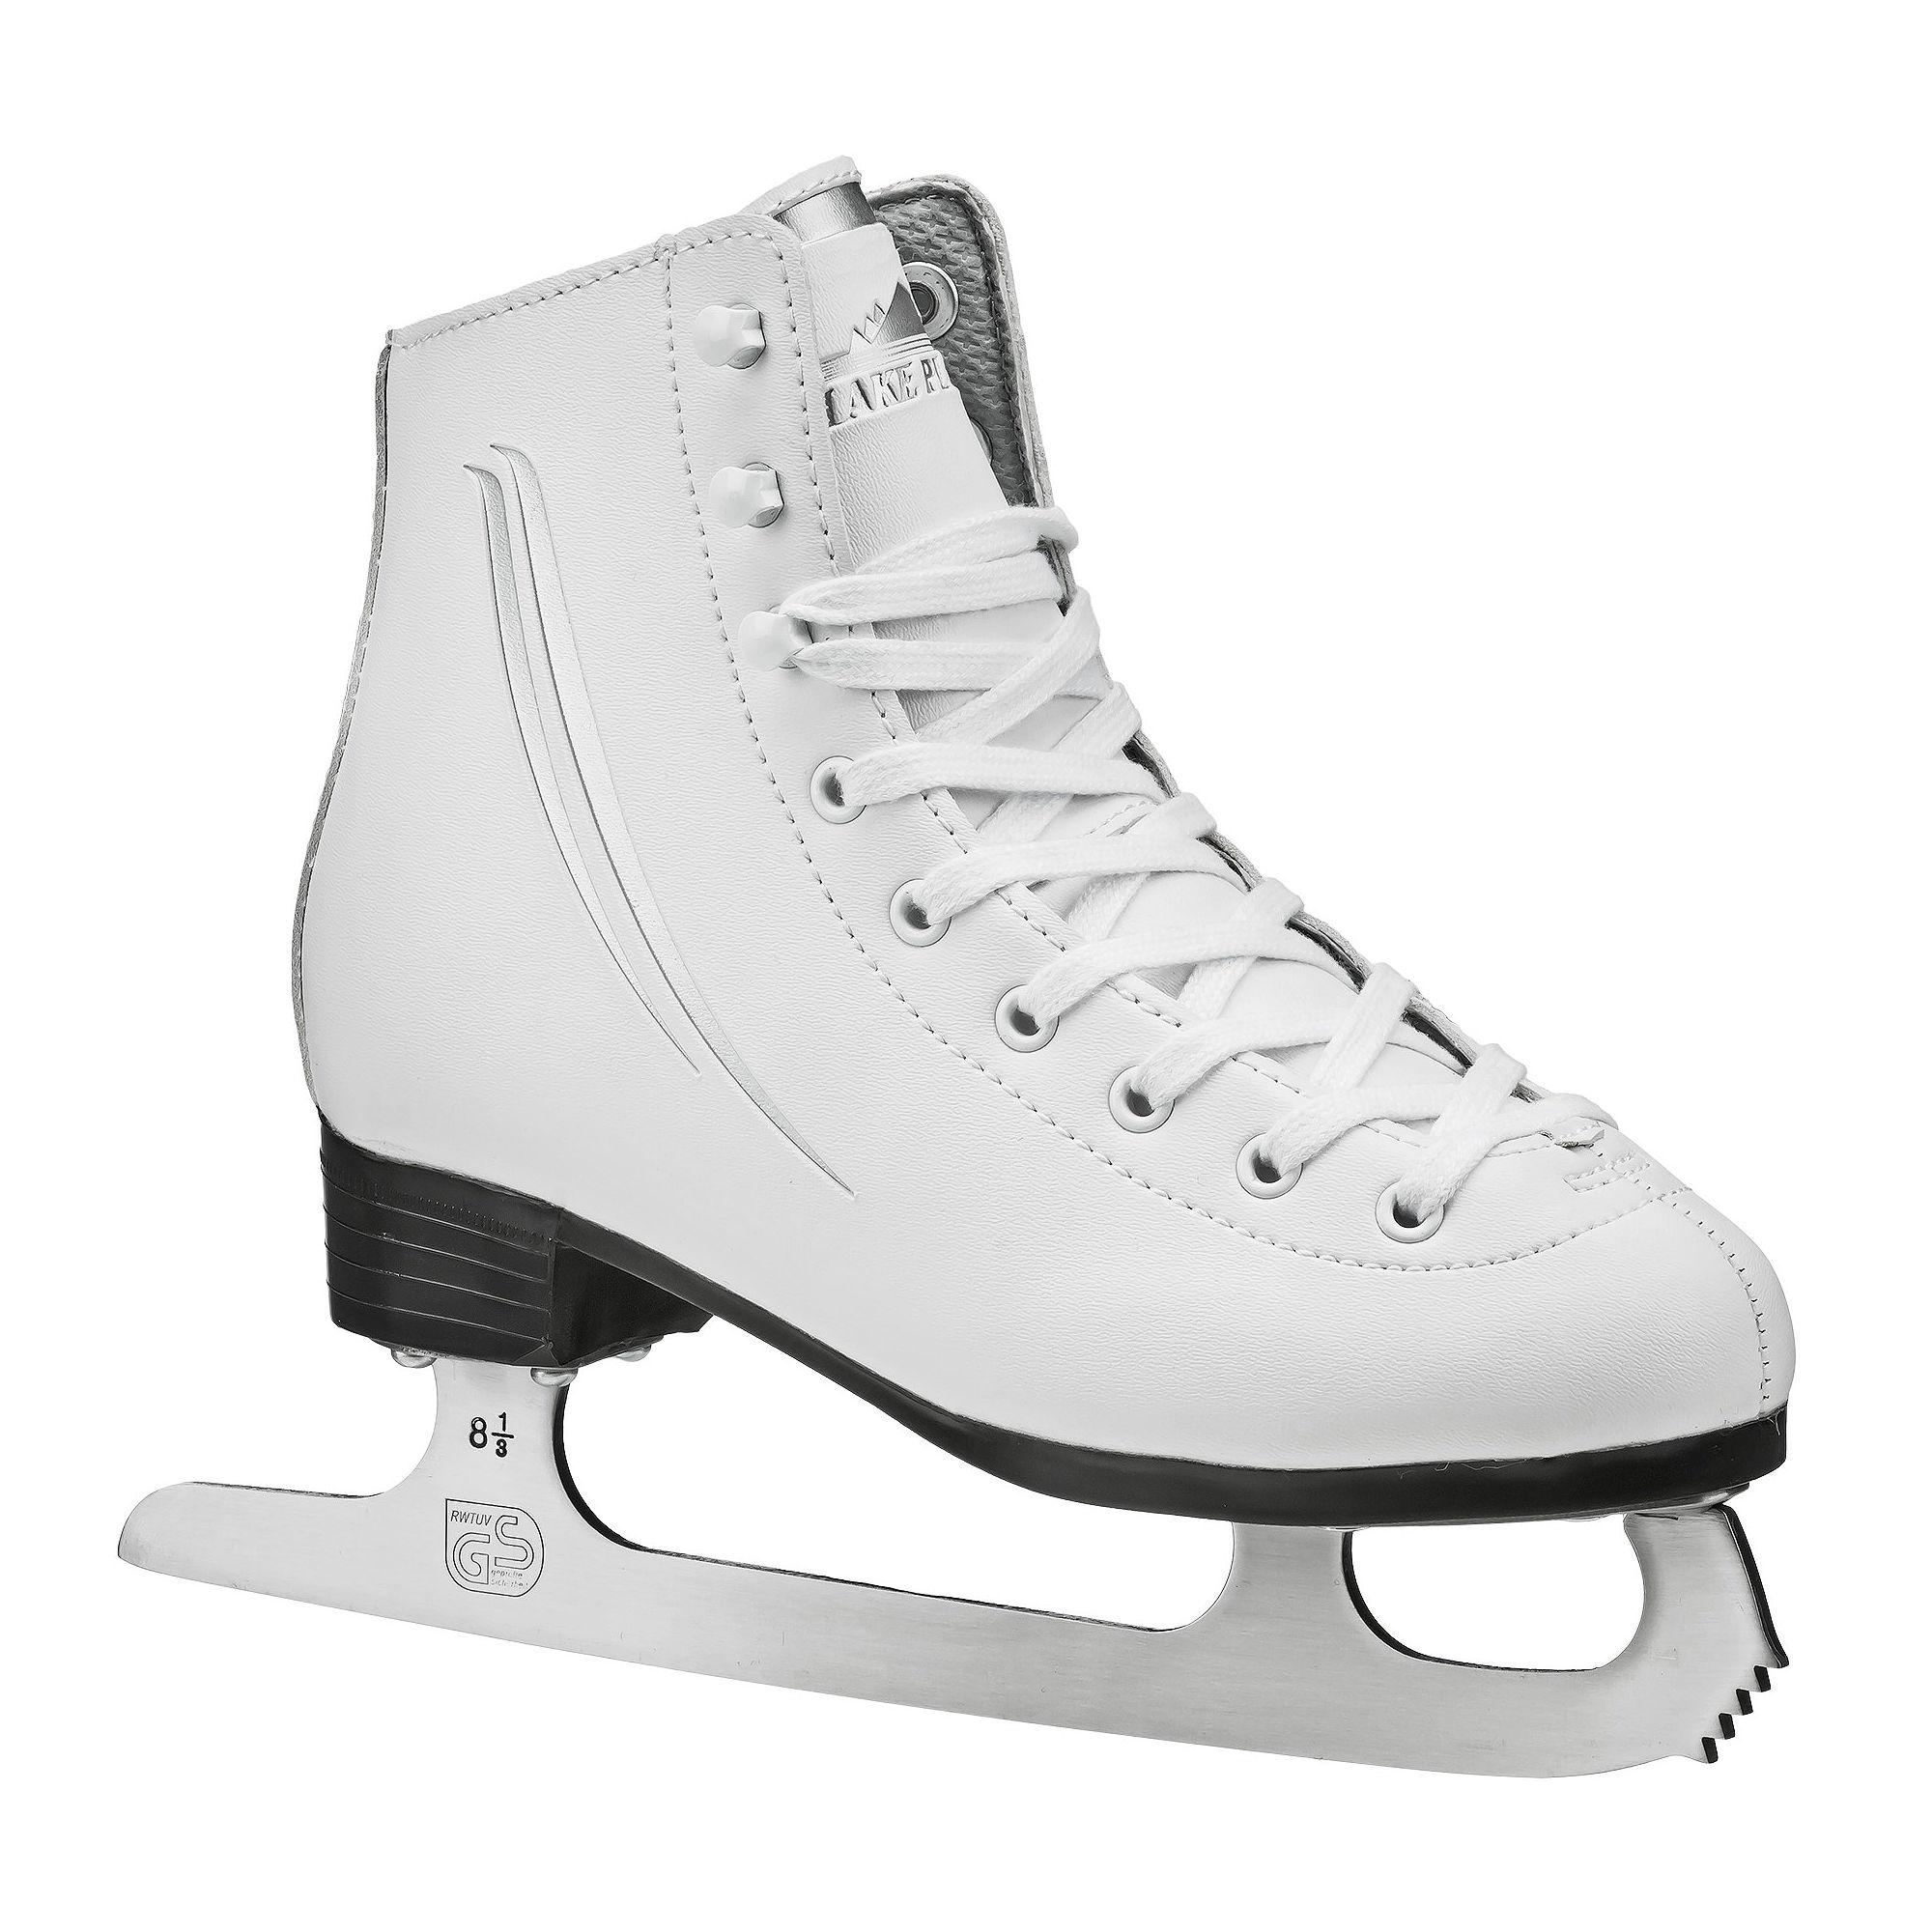 Roller skates jcpenney -  Upc 049288052042 Product Image For Lake Placid Cascade Ice Skates Girls Upcitemdb Com